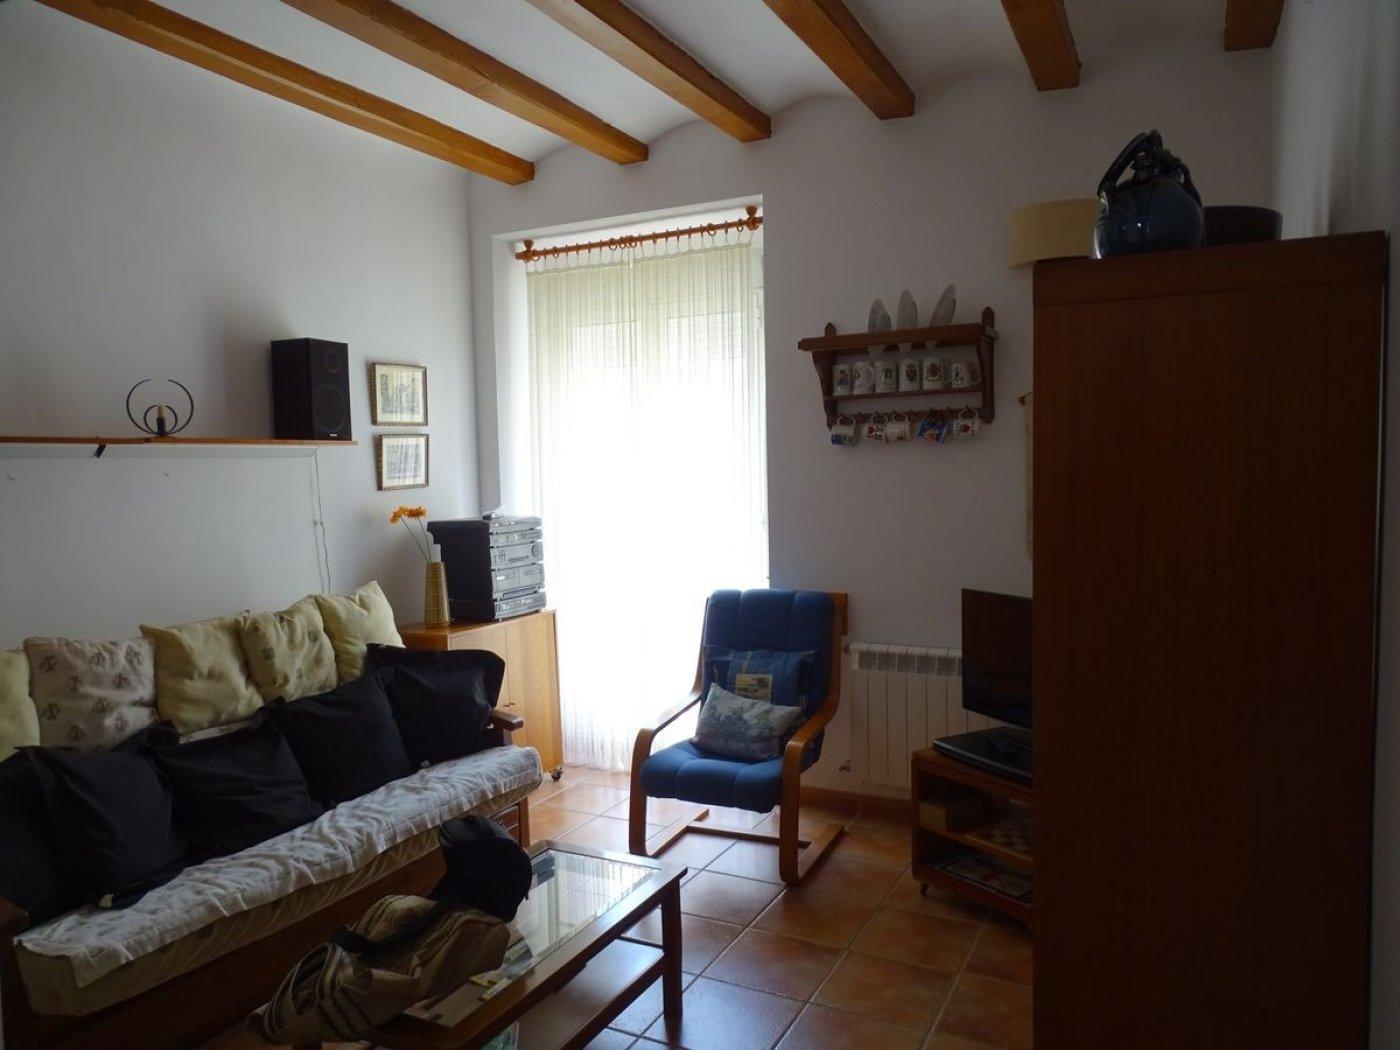 Flat for sale in *PUERTO, Sant Carles de la Rapita